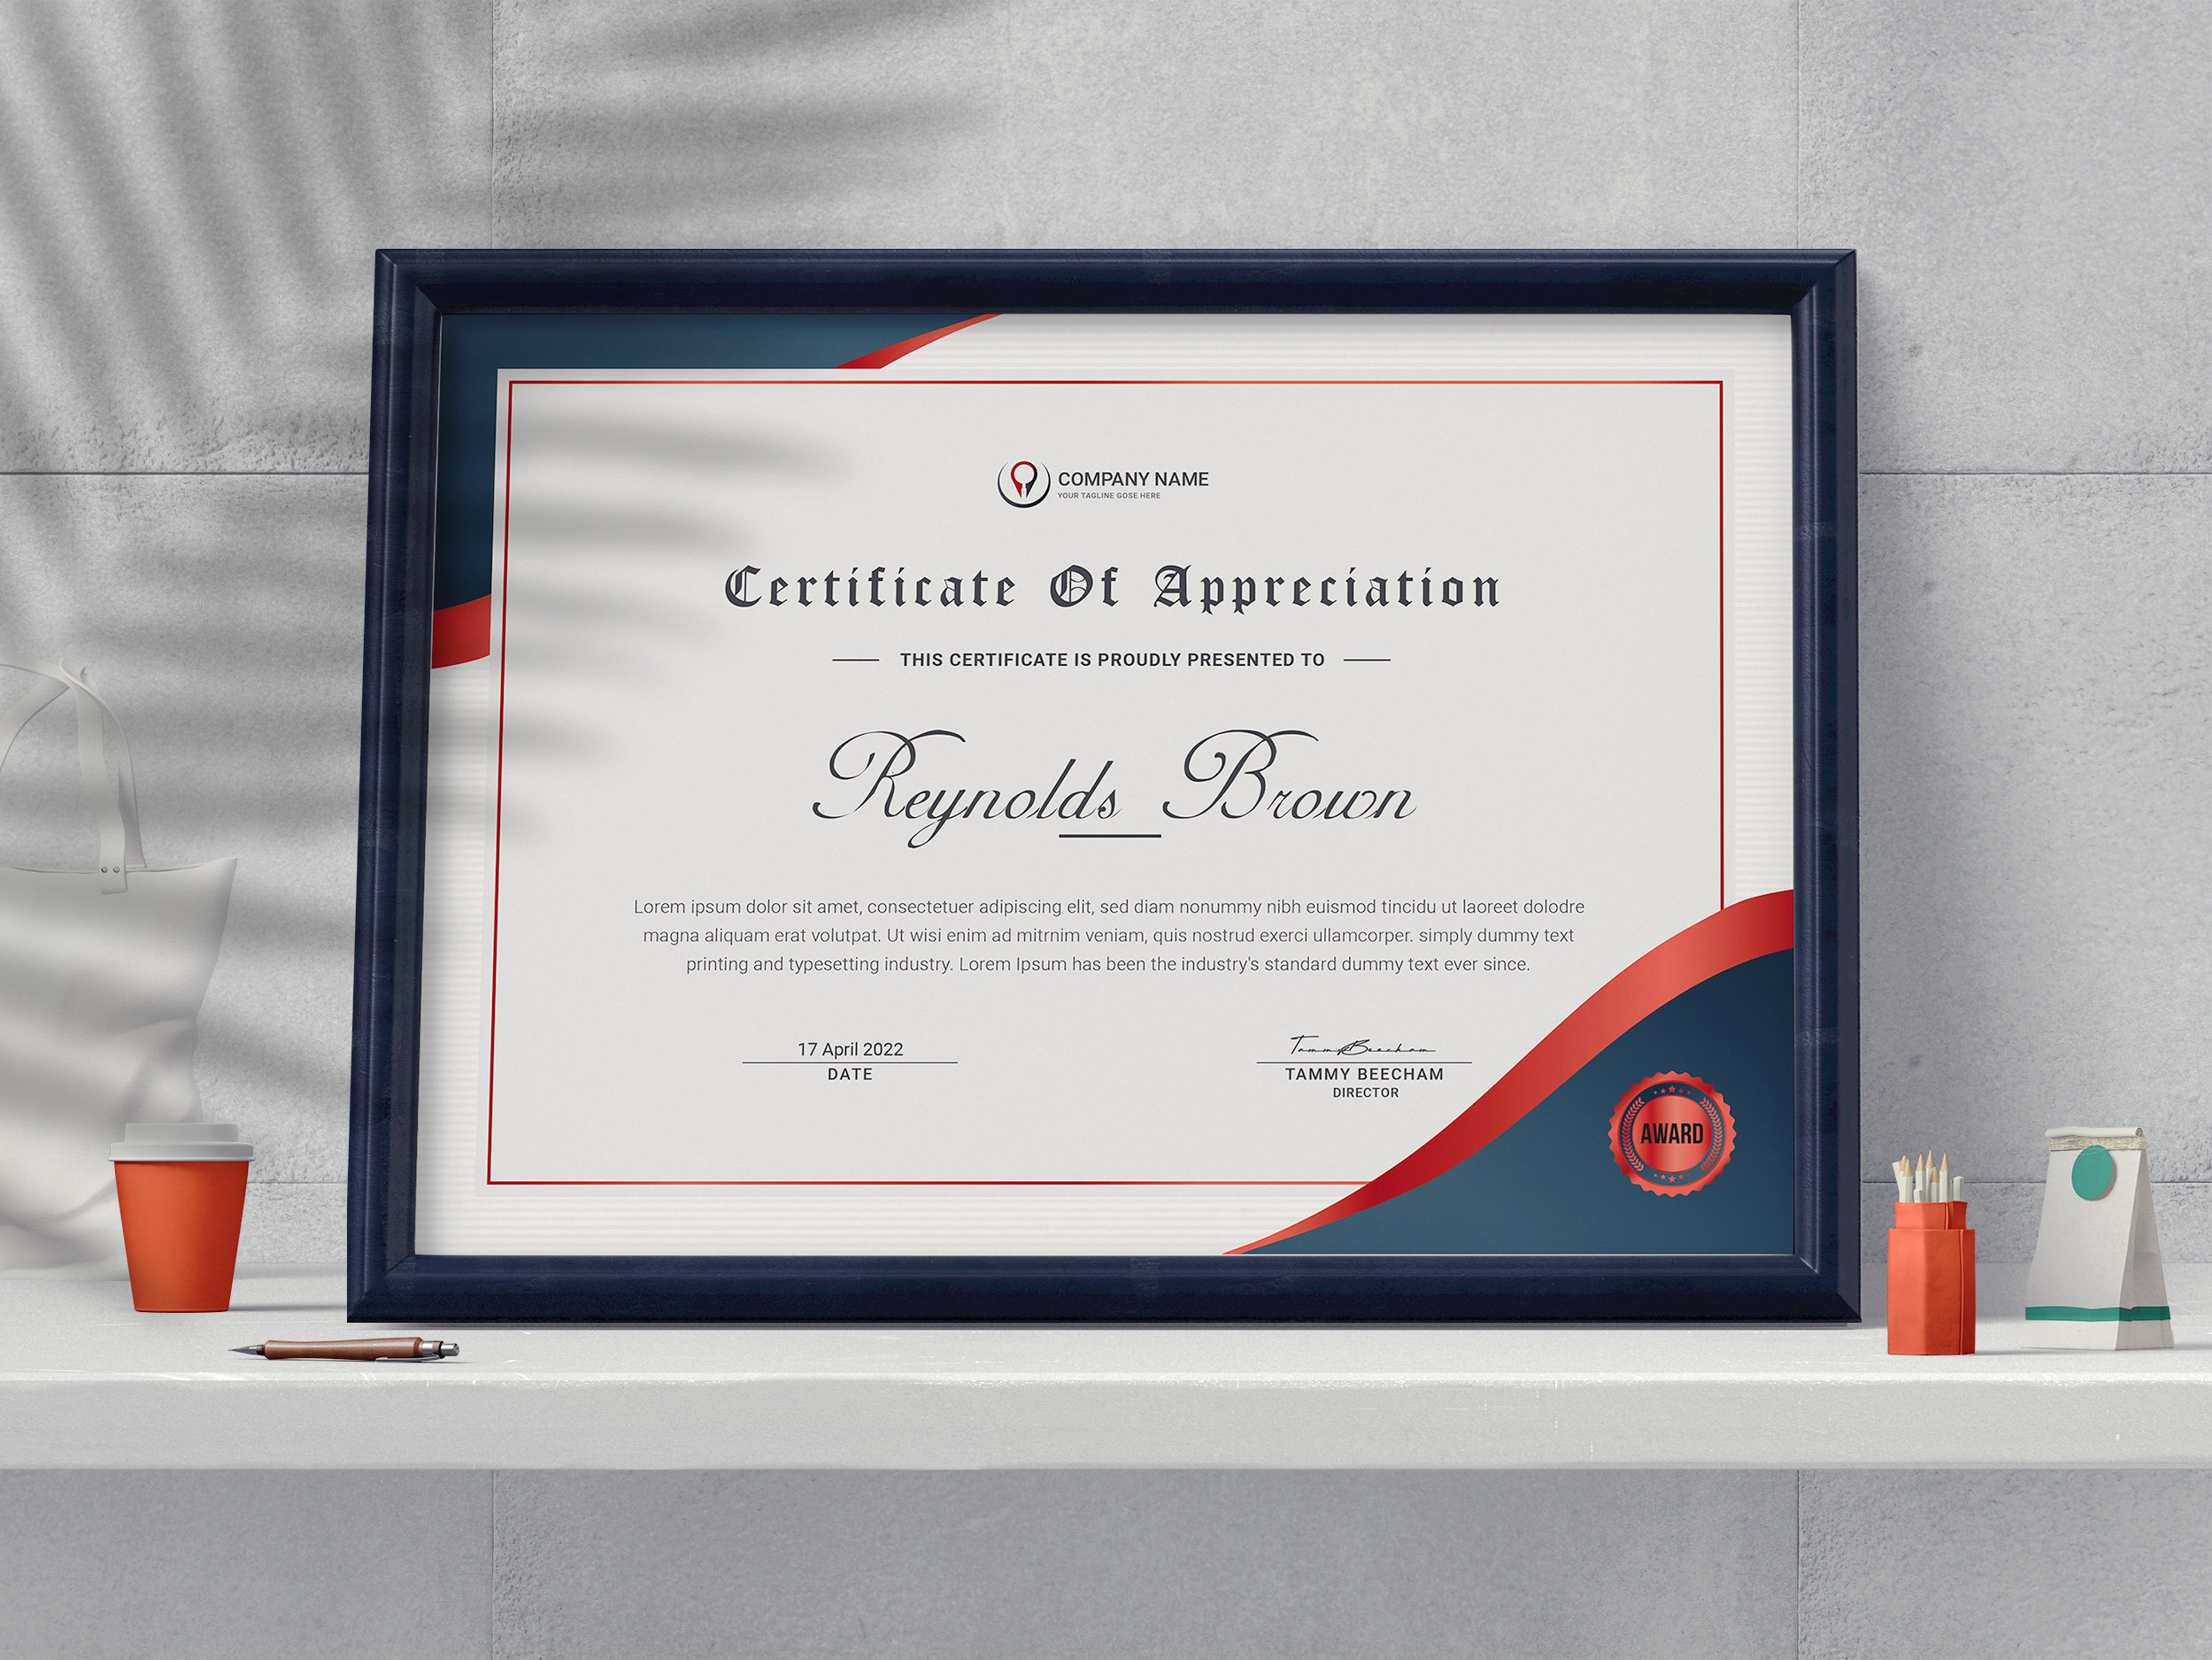 Certificate Template Word, Certificate of Completion, Appreciation  Certificate, Achievement Certificate, Award Certificate, Word Editable Pertaining To Award Certificate Templates Word 2007